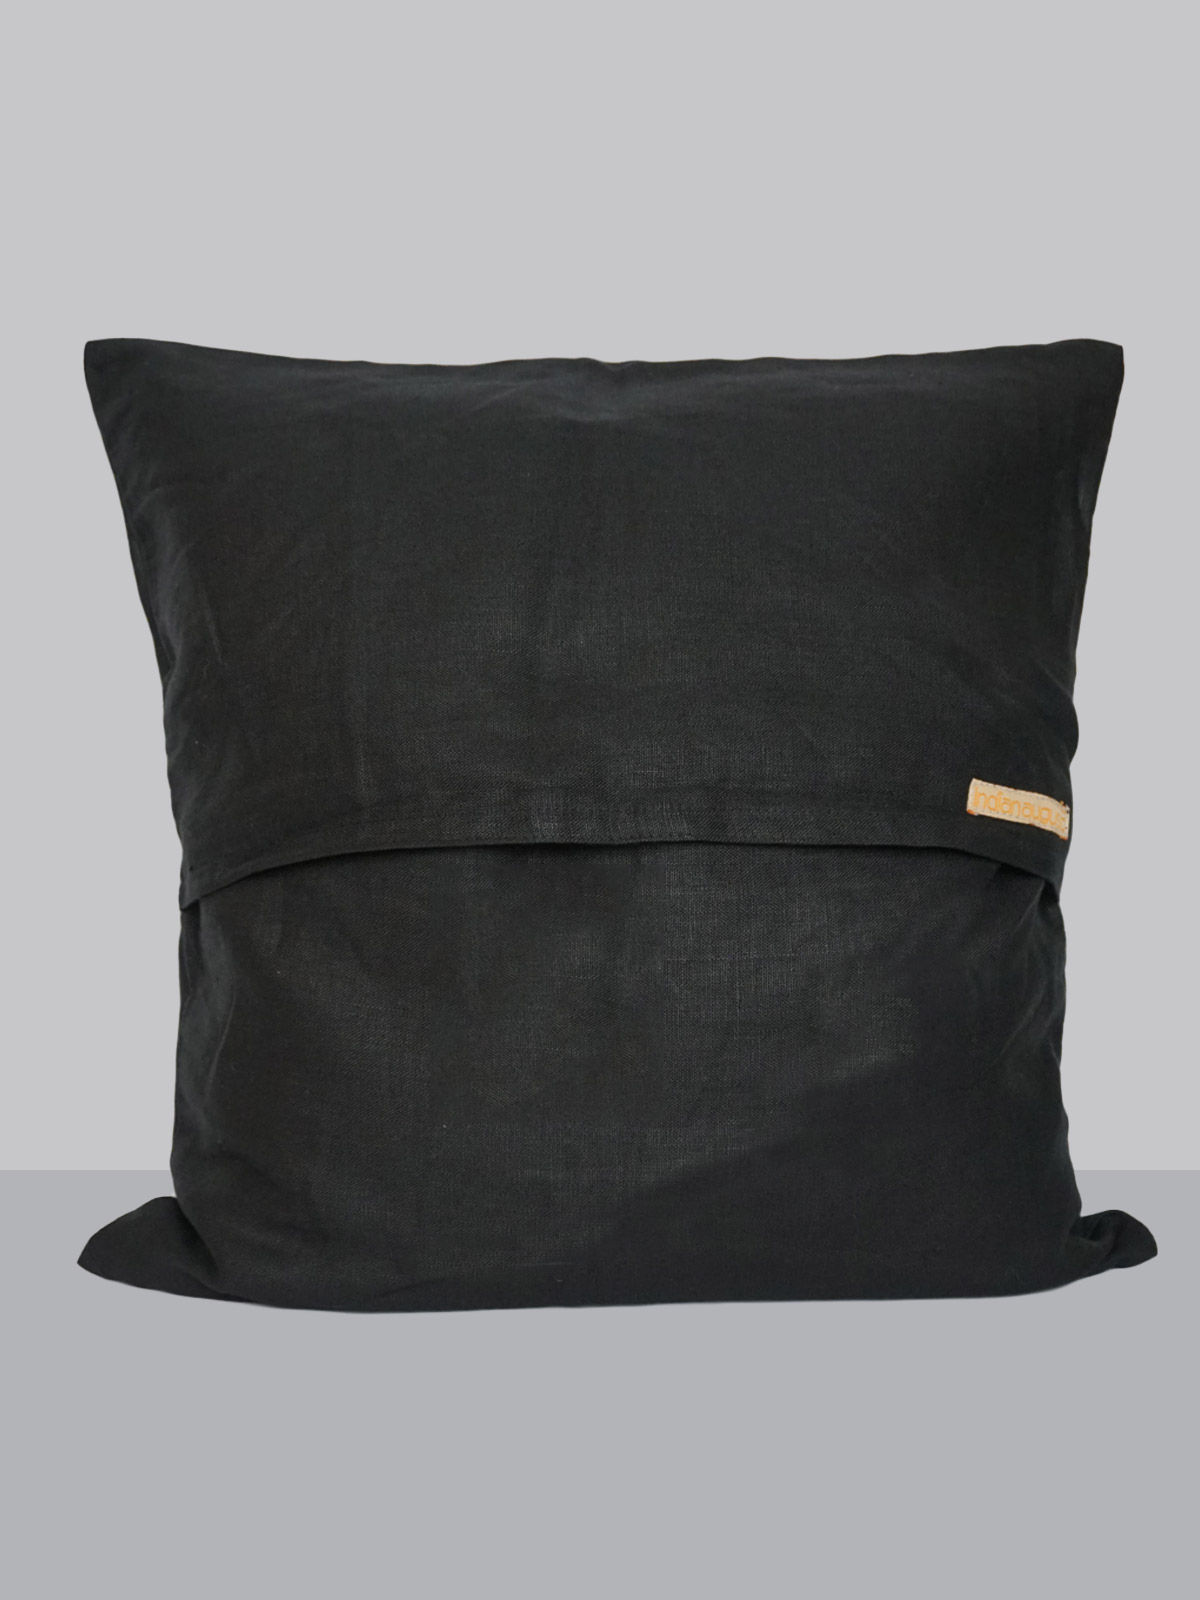 Black linen zari embroided cushion cover